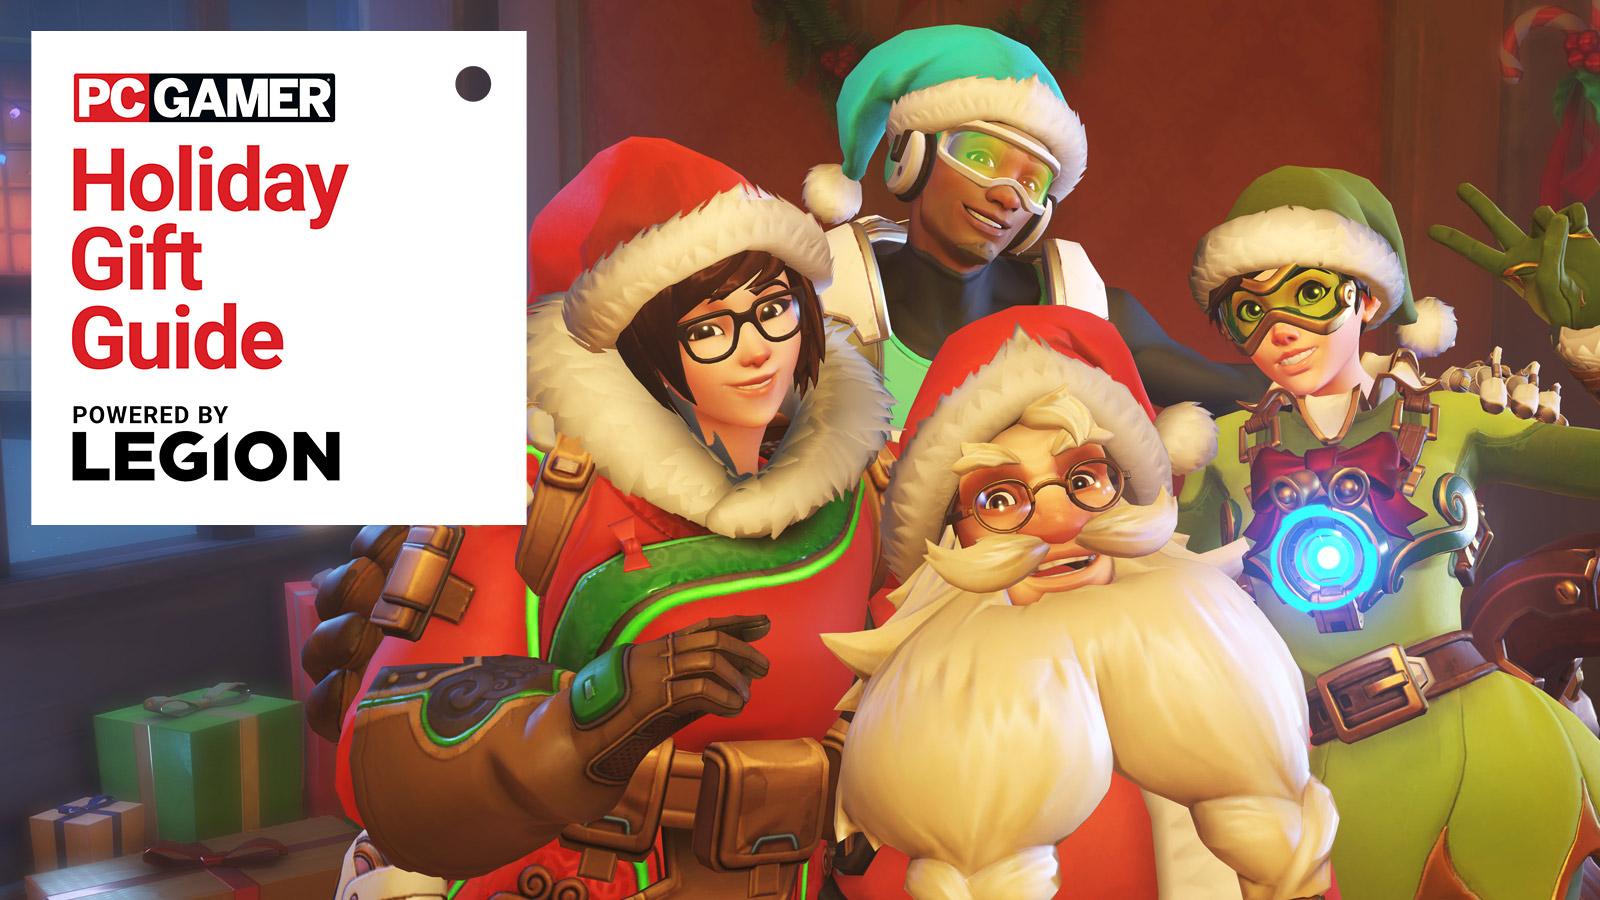 PC Gamer Holiday Gift Guide 2017 | PC Gamer